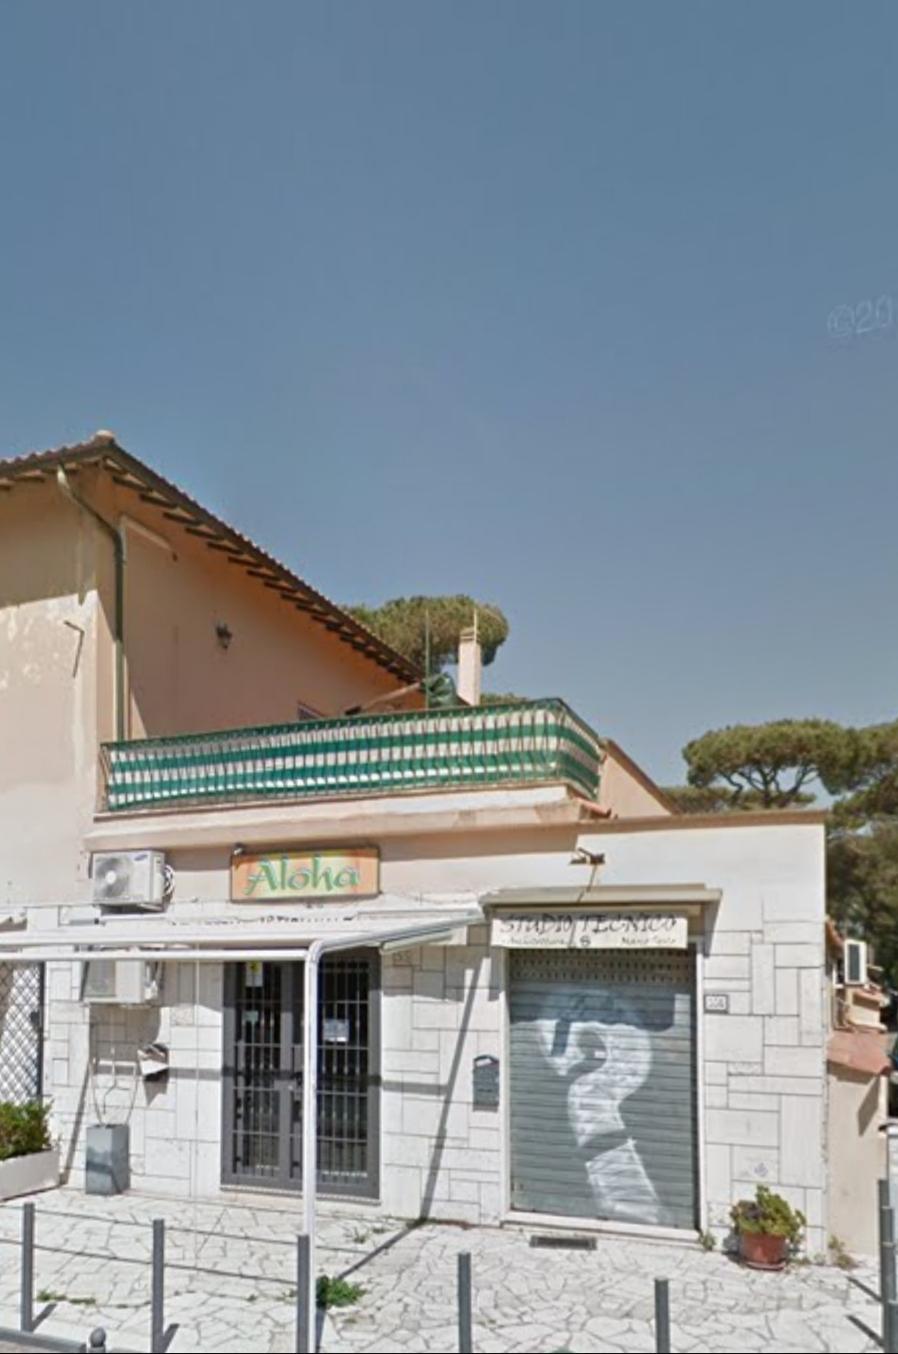 Commerciale affitto agenzia immobiliare roma for Affitto commerciale